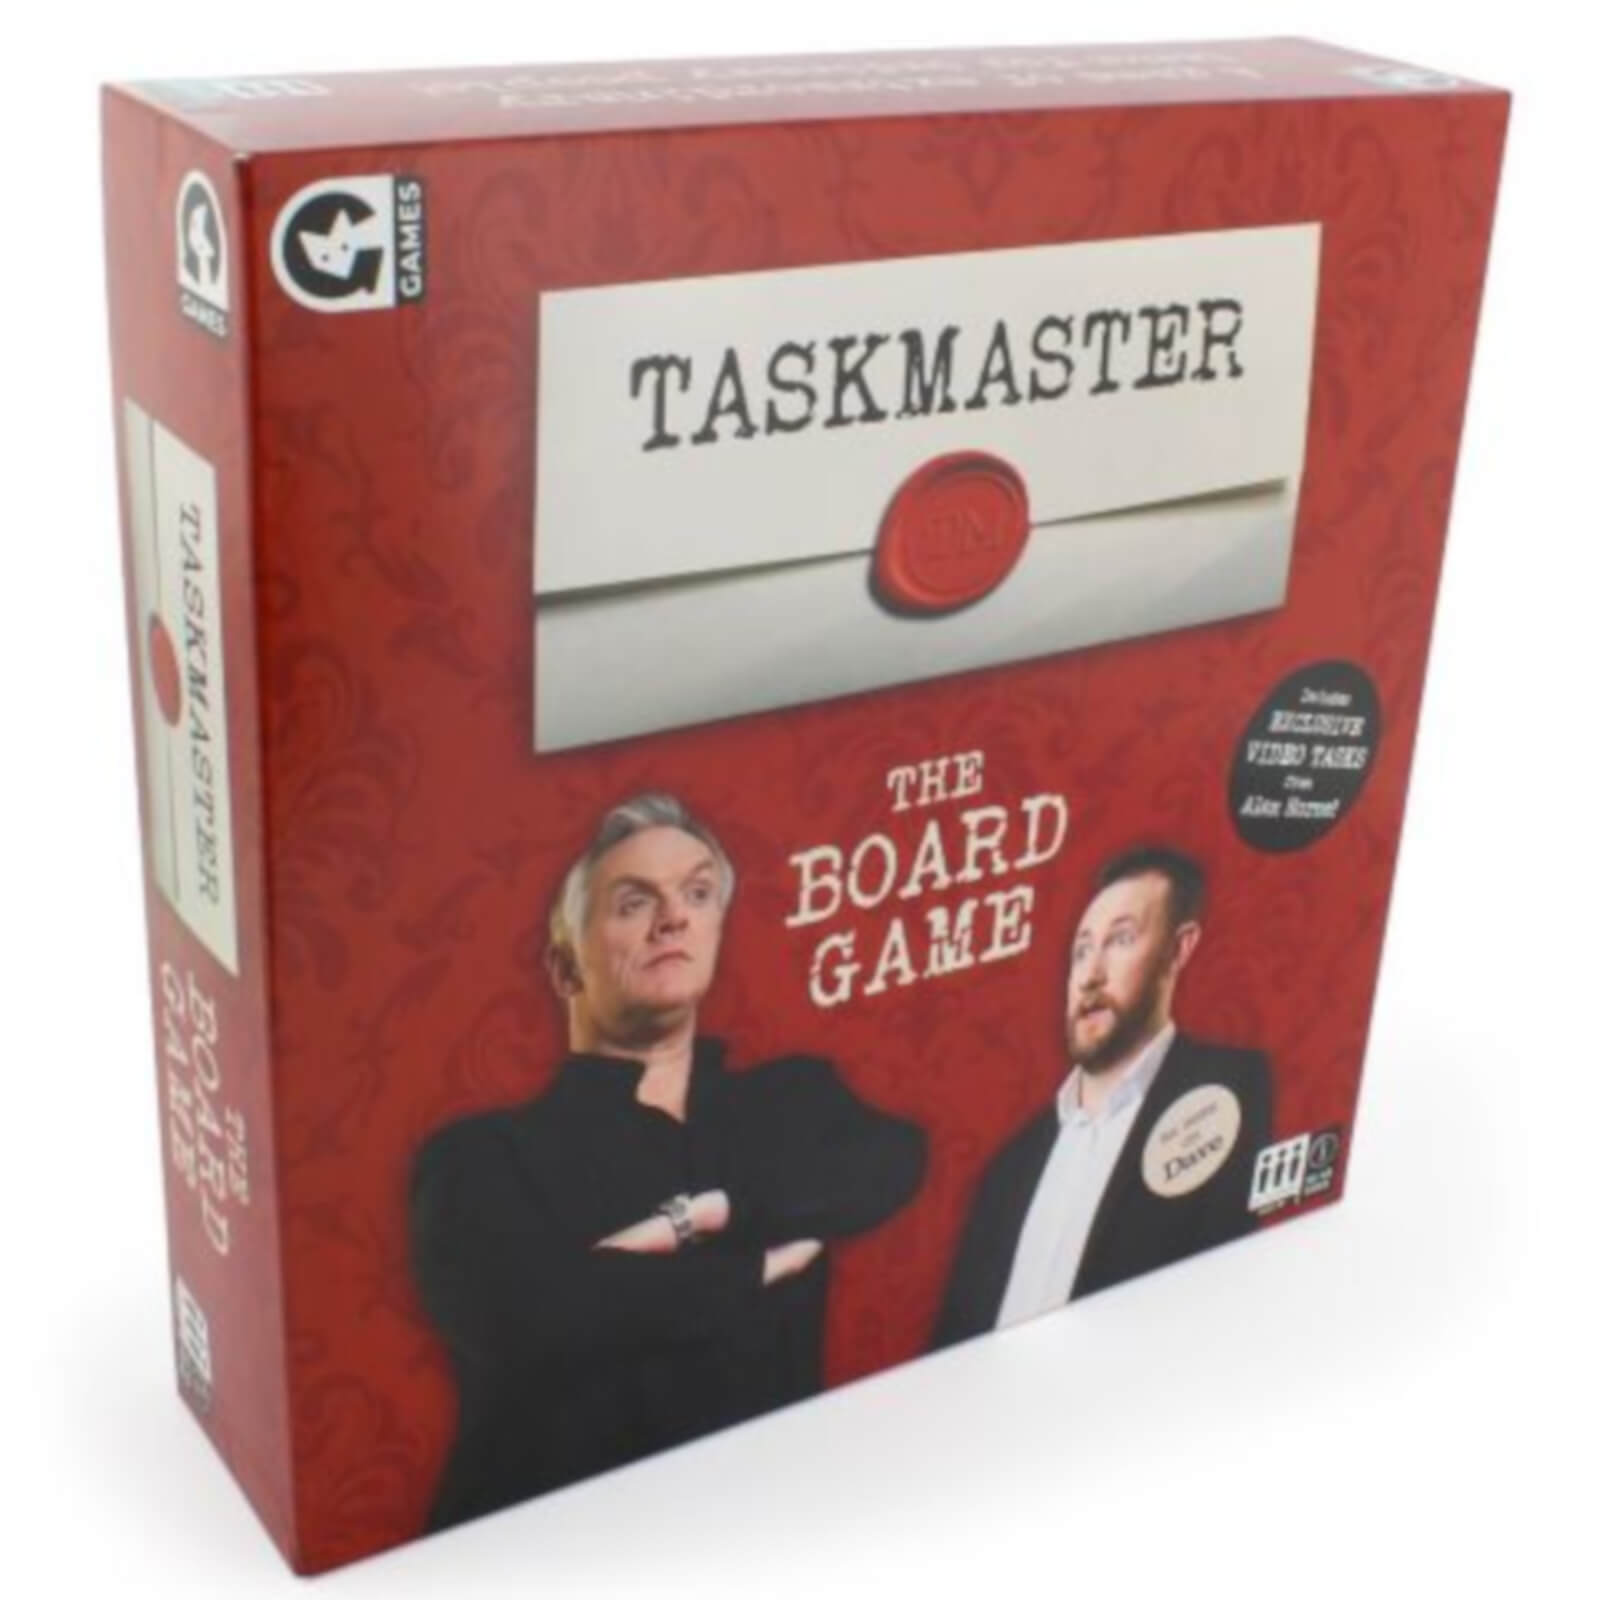 Image of Taskmaster Board Game